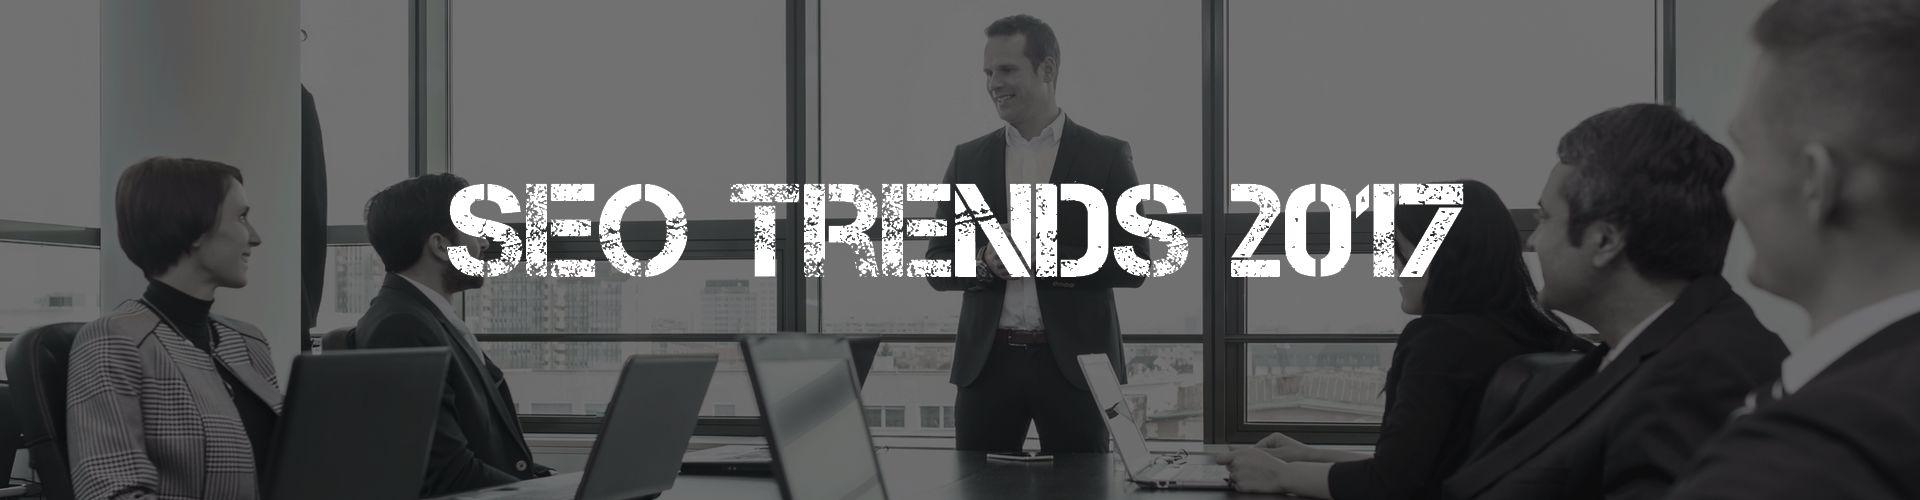 SEO-Trends-2017-Agentur-Hannover-Webdesign